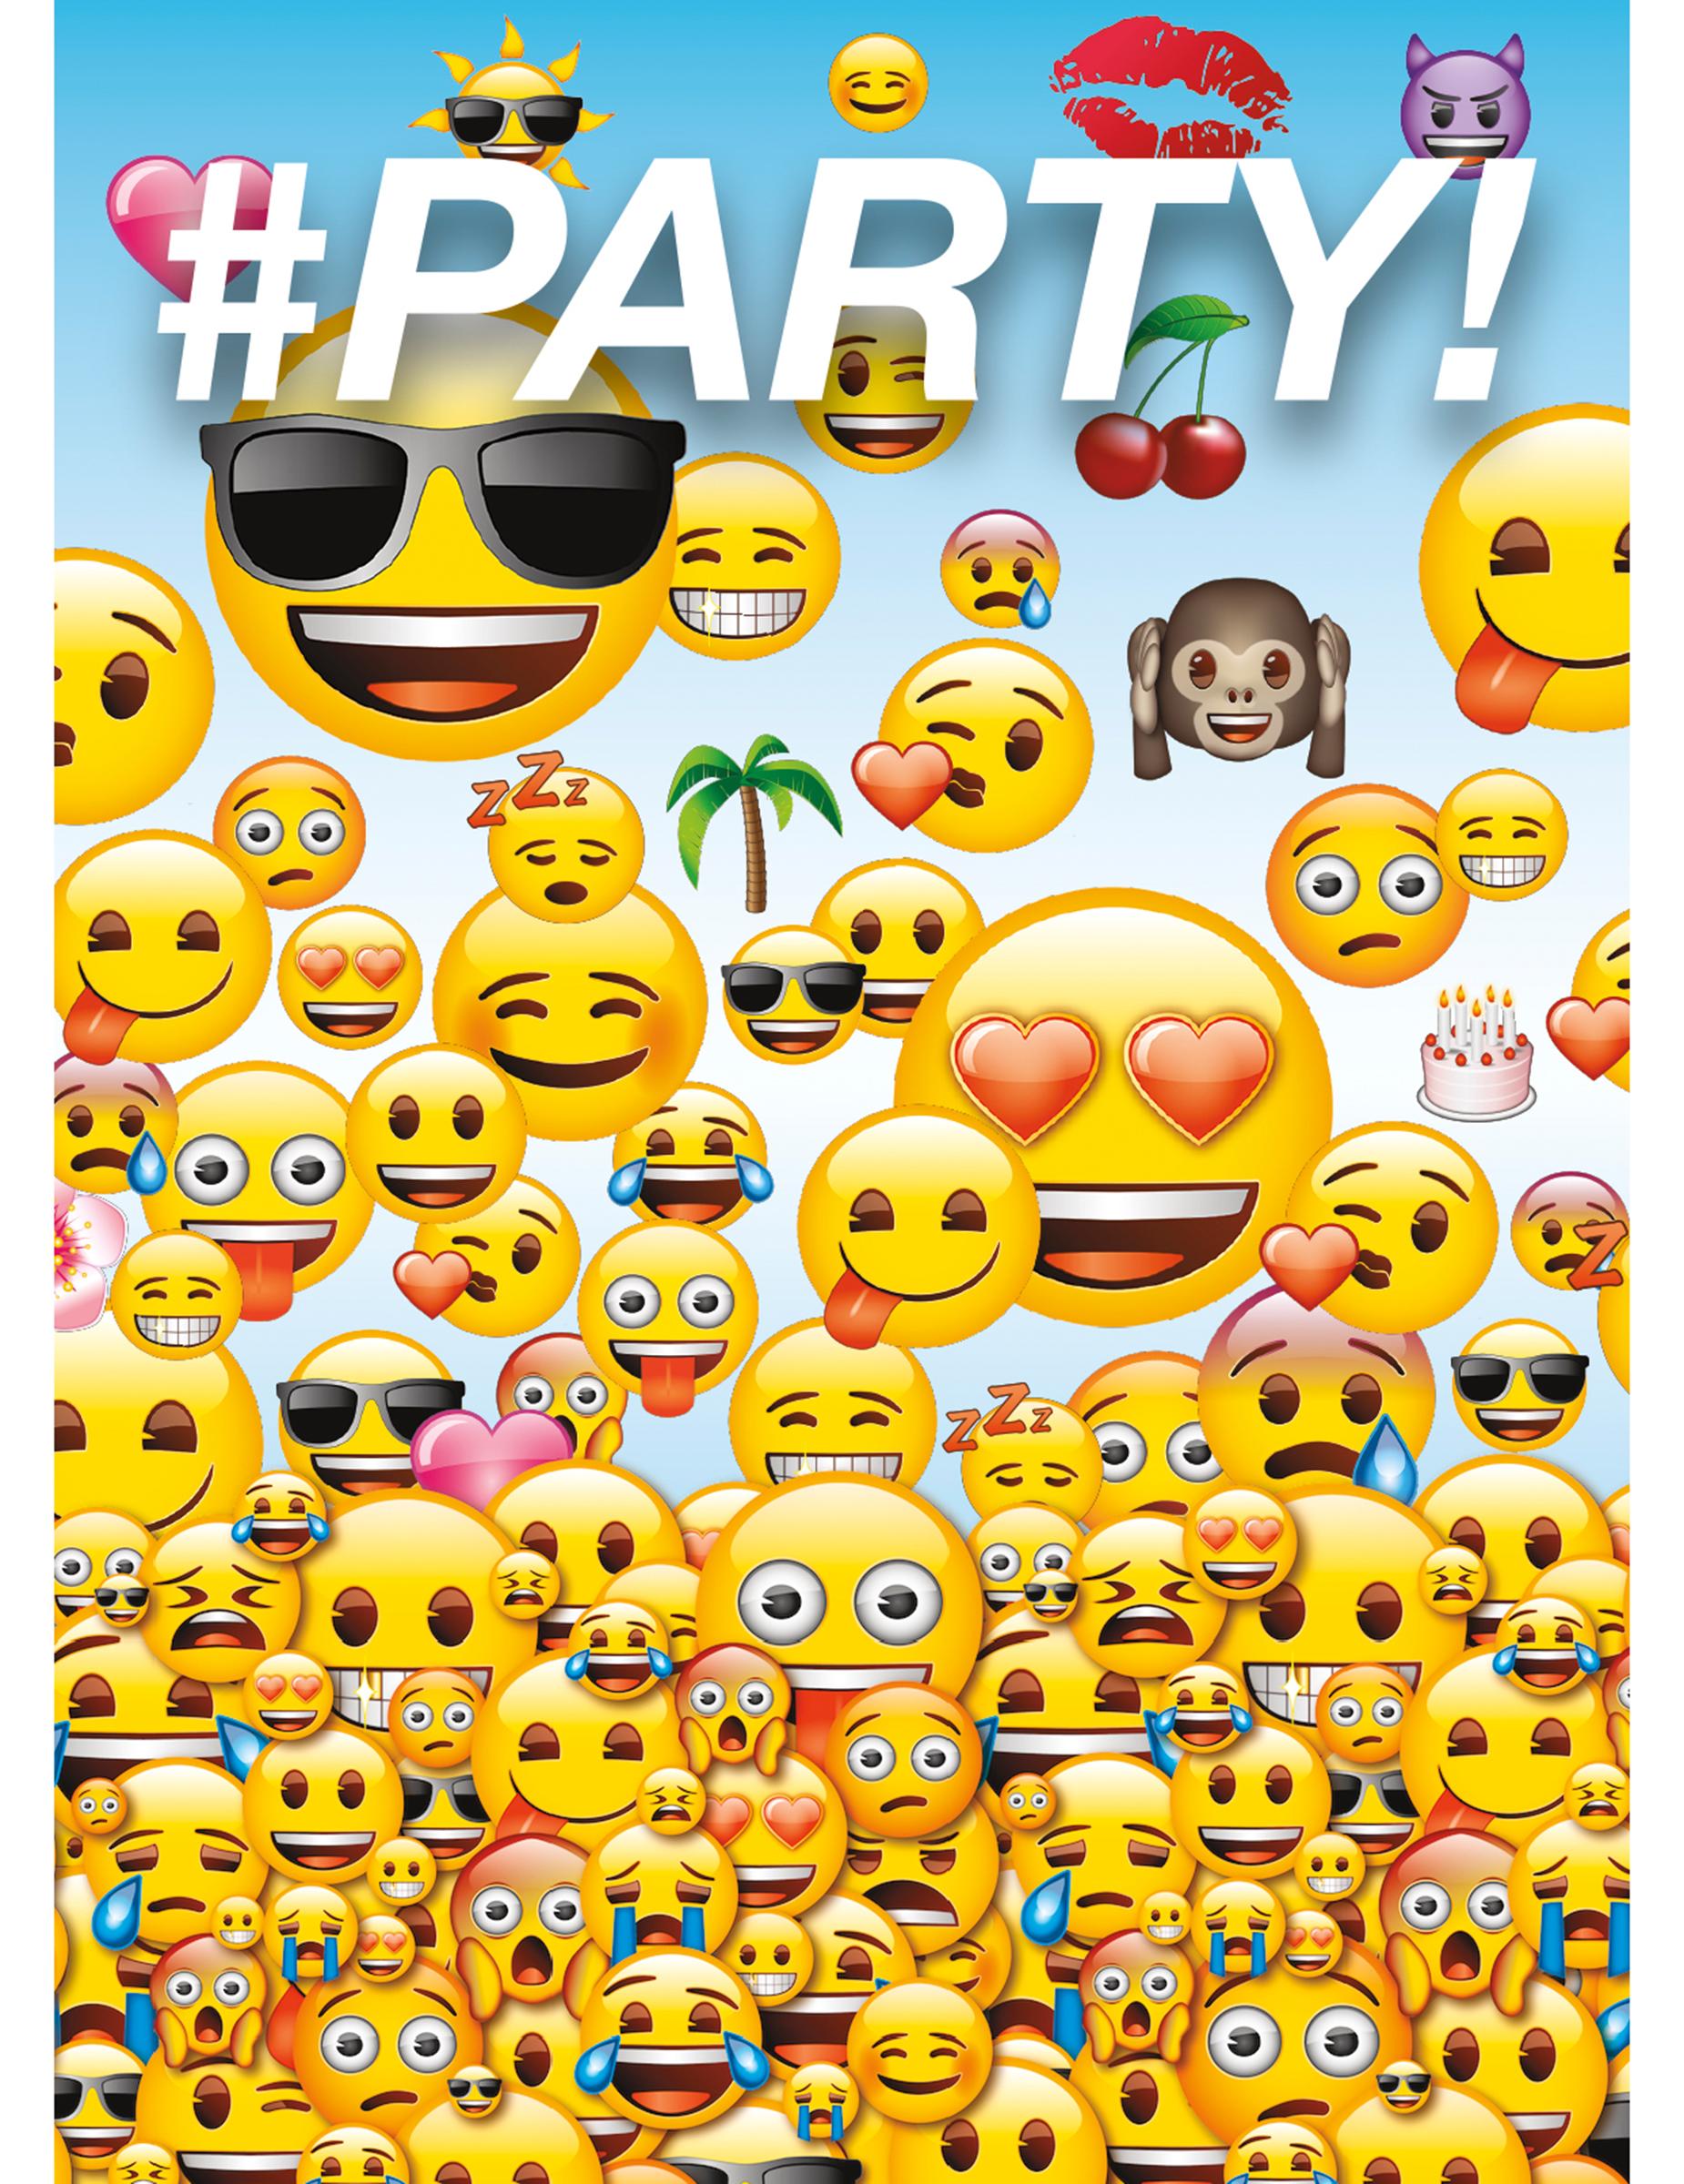 8 cartes d 39 invitation emoji d coration anniversaire et f tes th me sur vegaoo party. Black Bedroom Furniture Sets. Home Design Ideas